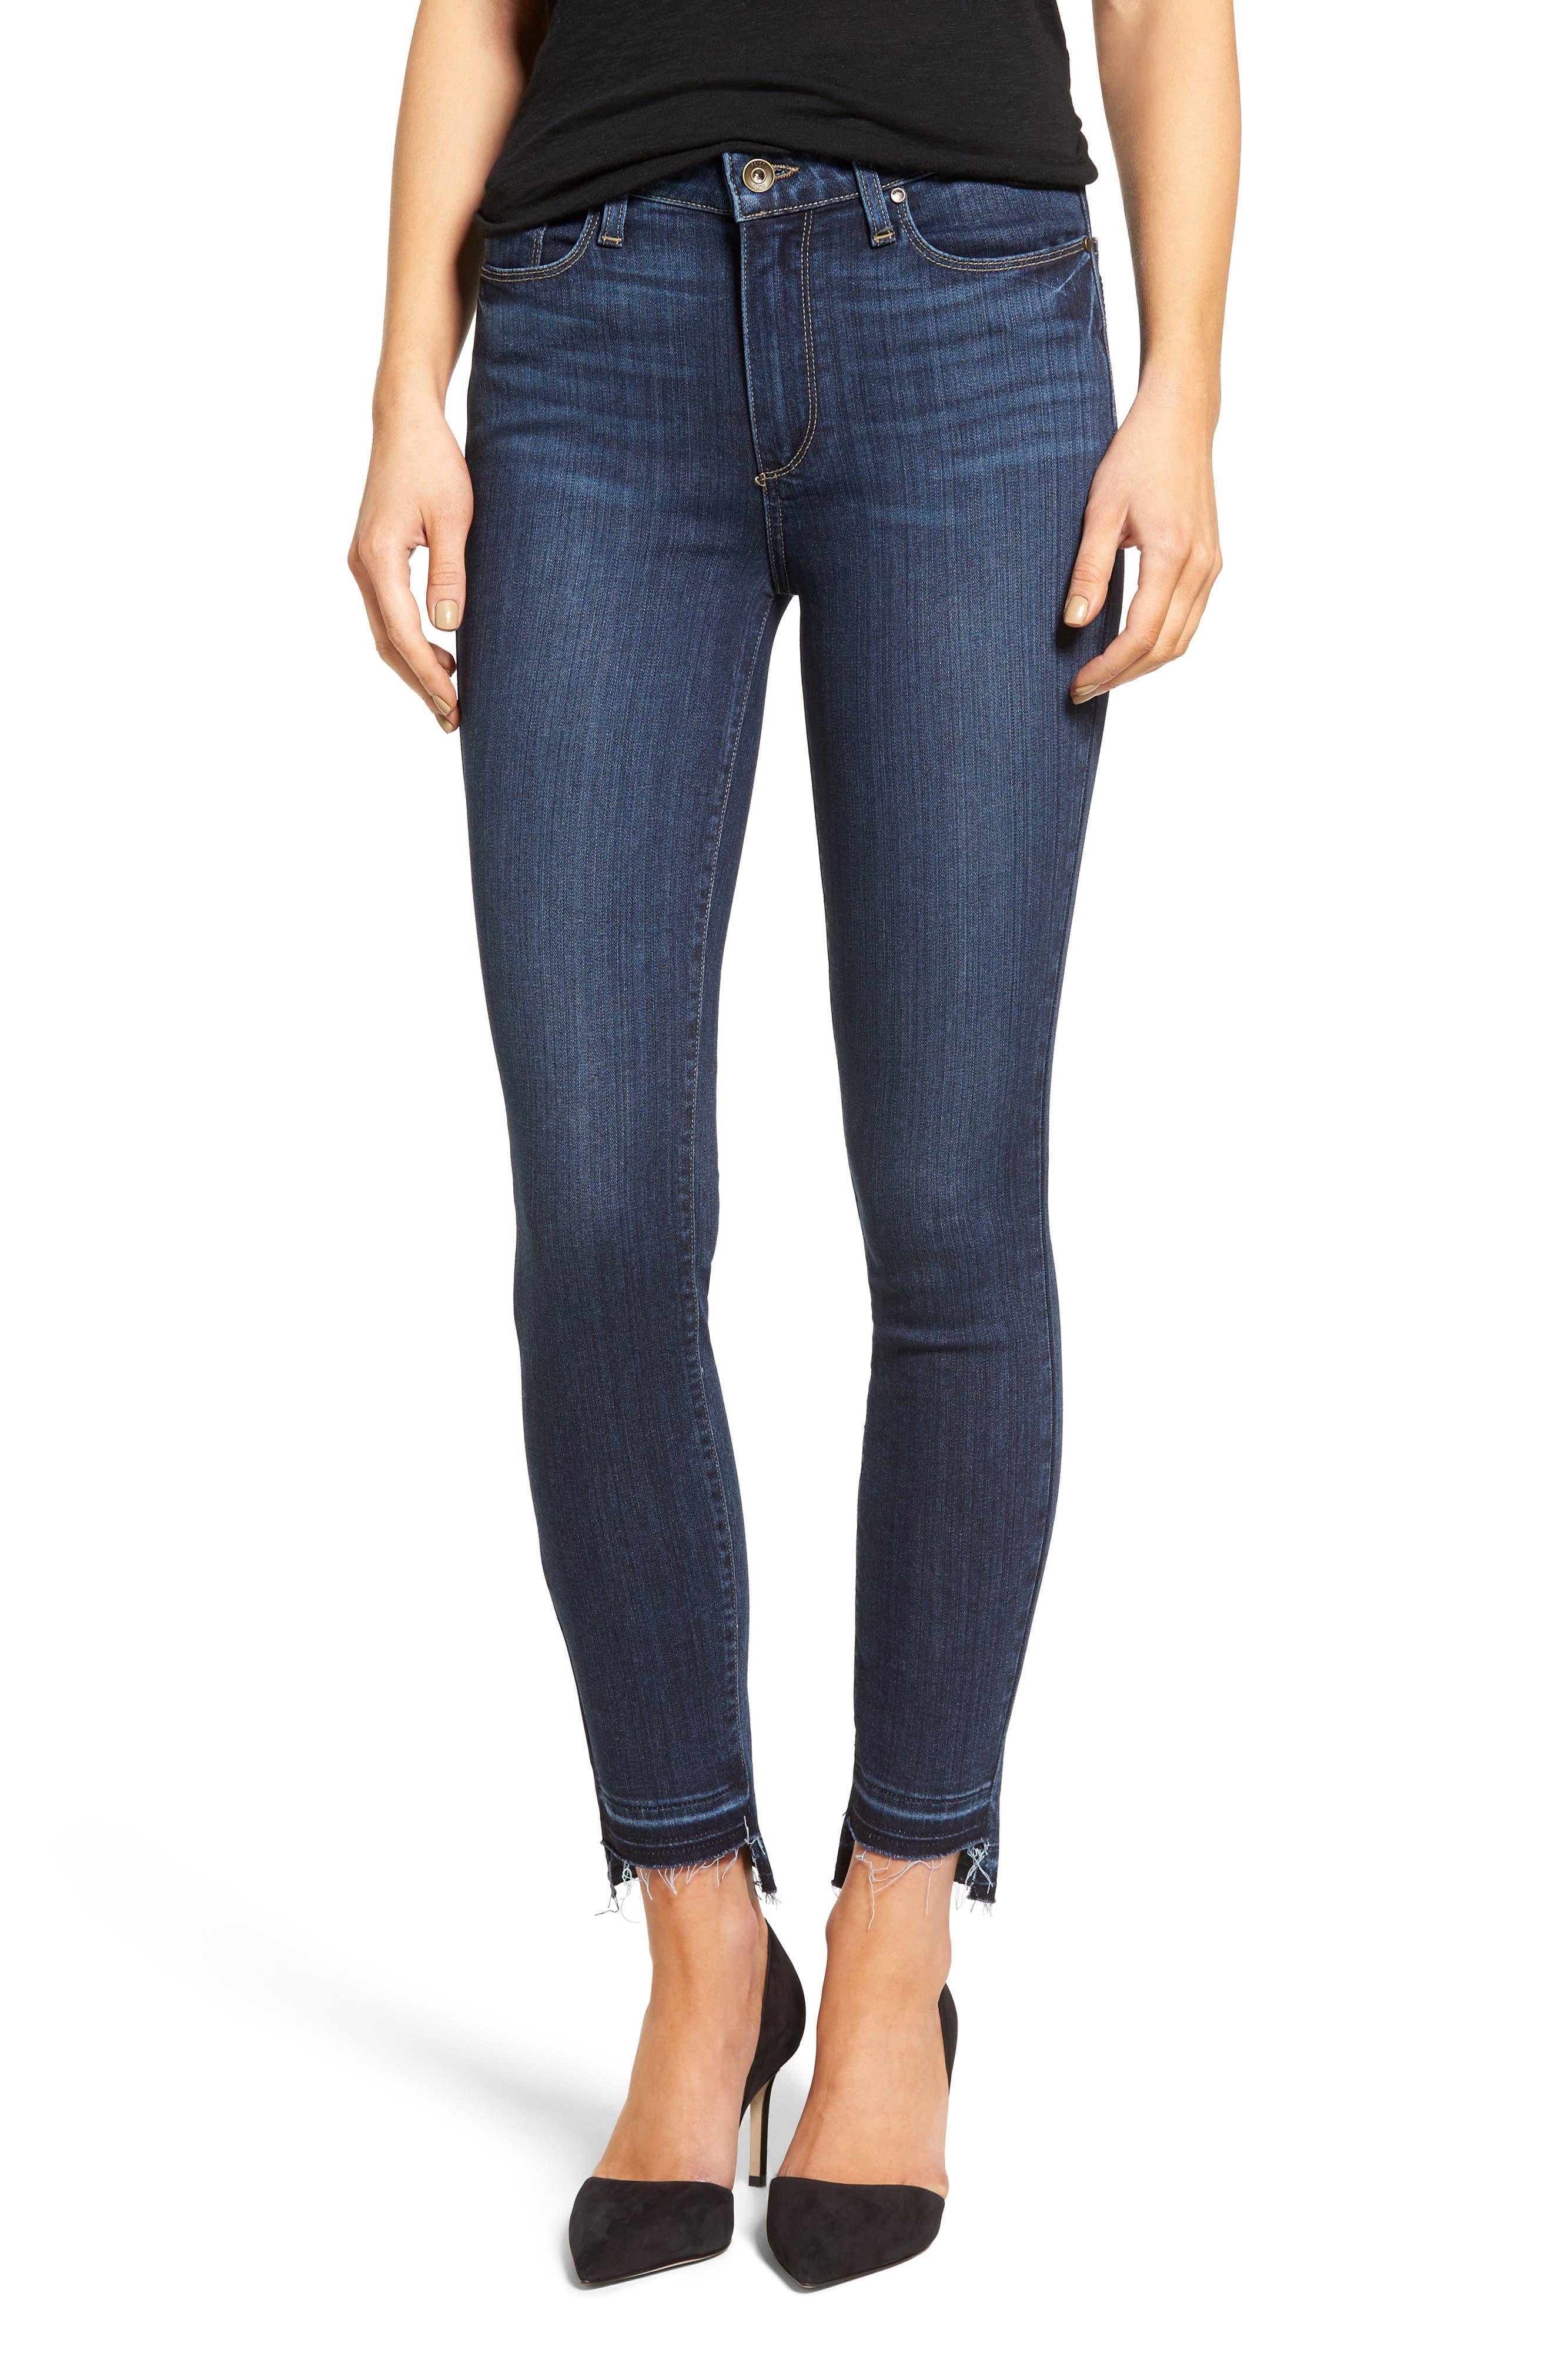 PAIGE Hoxton High Waist Skinny Jeans, Main, color, 400